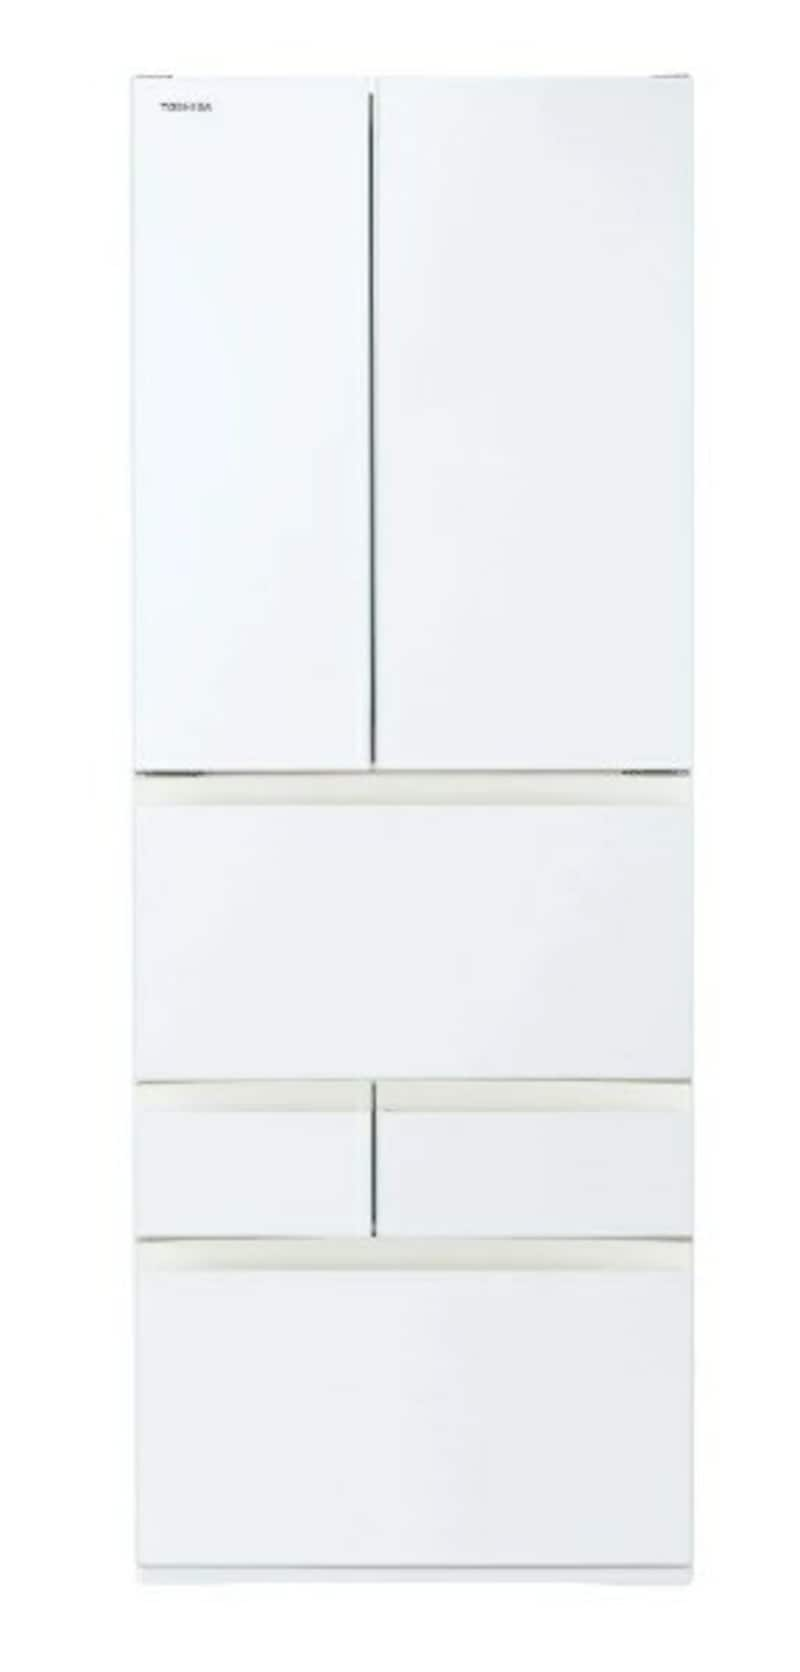 TOSHIBA(東芝),6ドア冷蔵庫 VEGETA(ベジータ),GR-T550FH(EW)